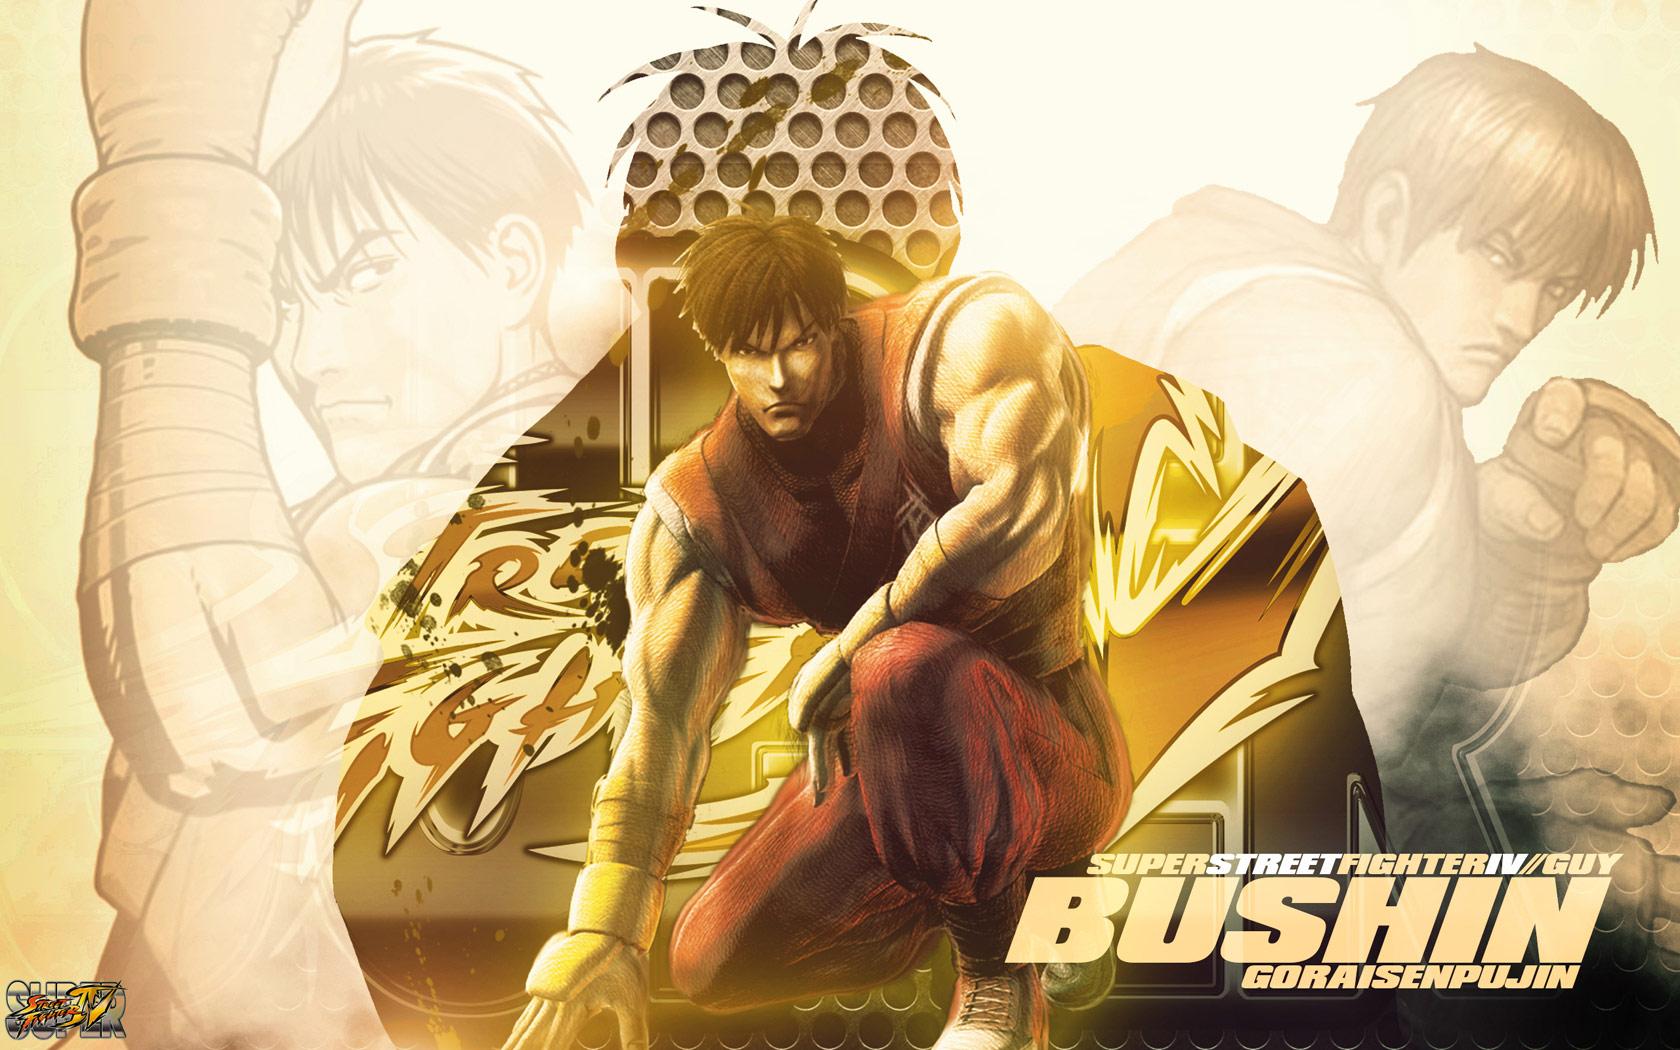 Guy Super Street Fighter 4 wallpaper by BossLogic